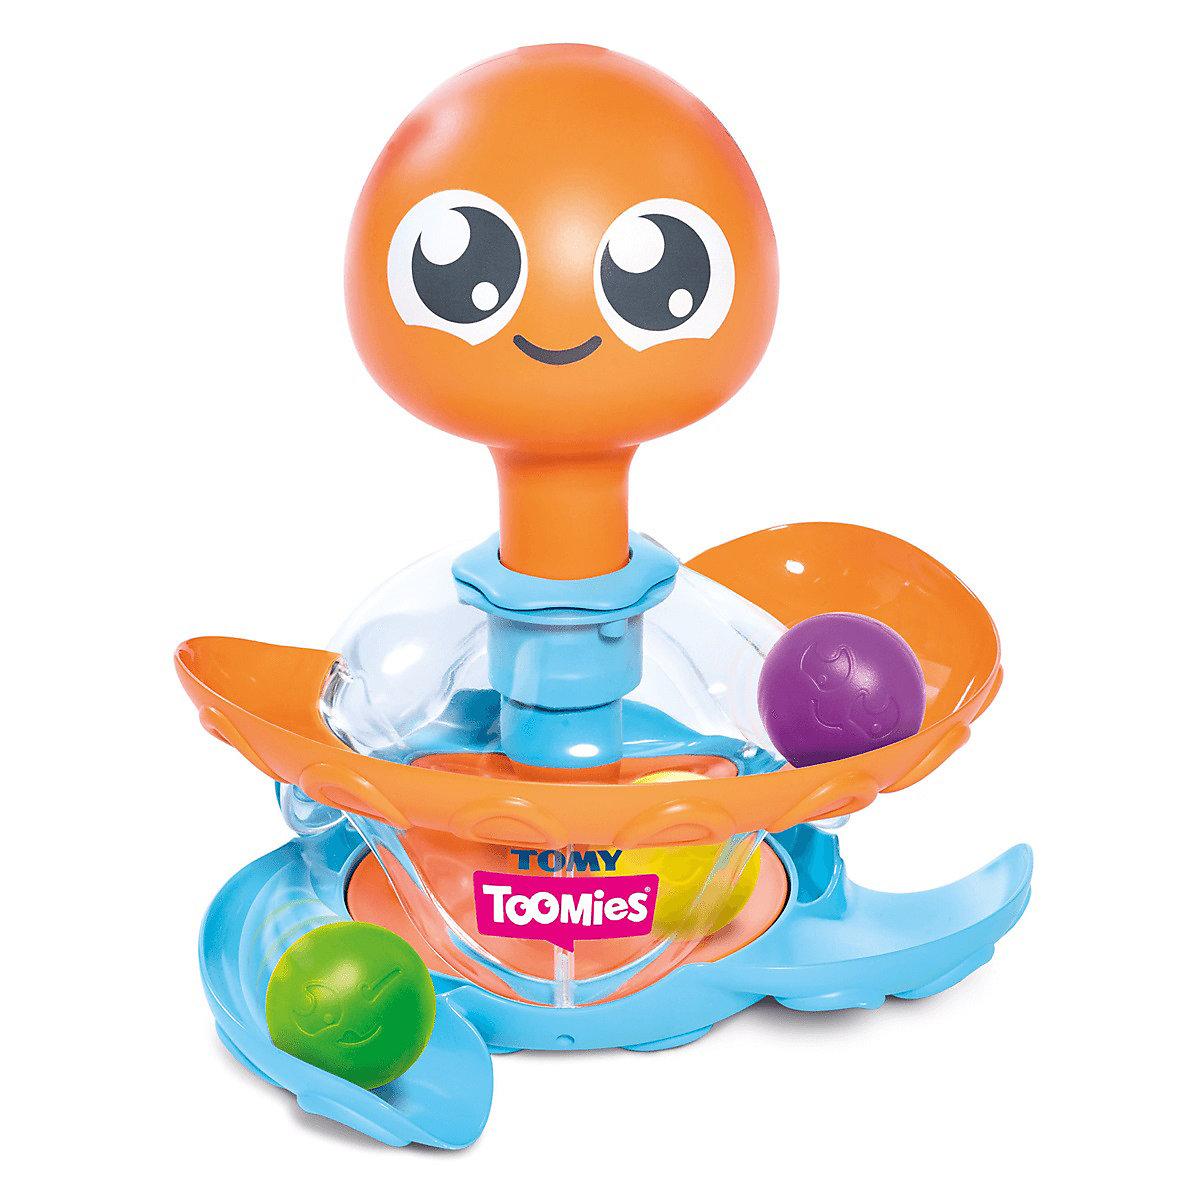 Tomy Toomies Octopus Ball Toy